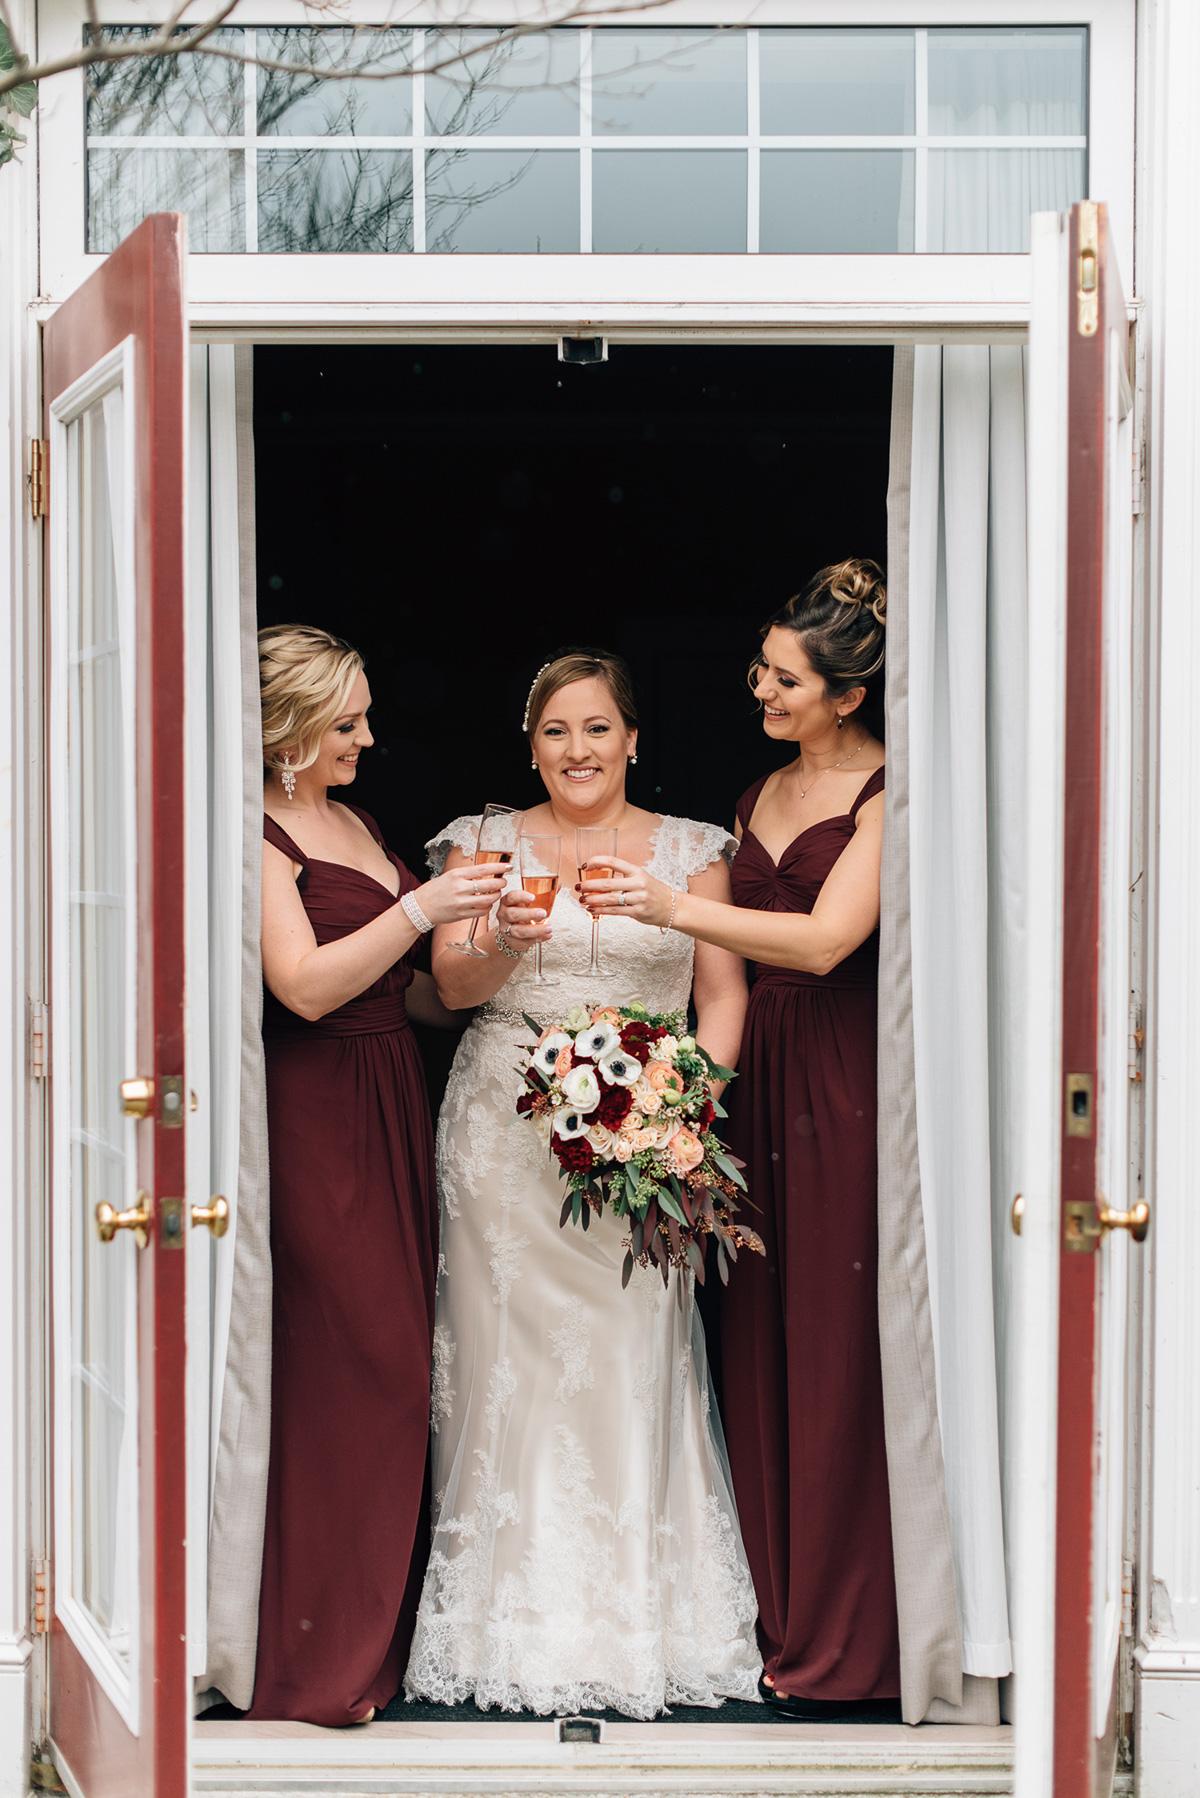 sara-wilde-photography-vineyard-bride-swish-list-inn-on-the-twenty-jordan-wedding-8.jpg